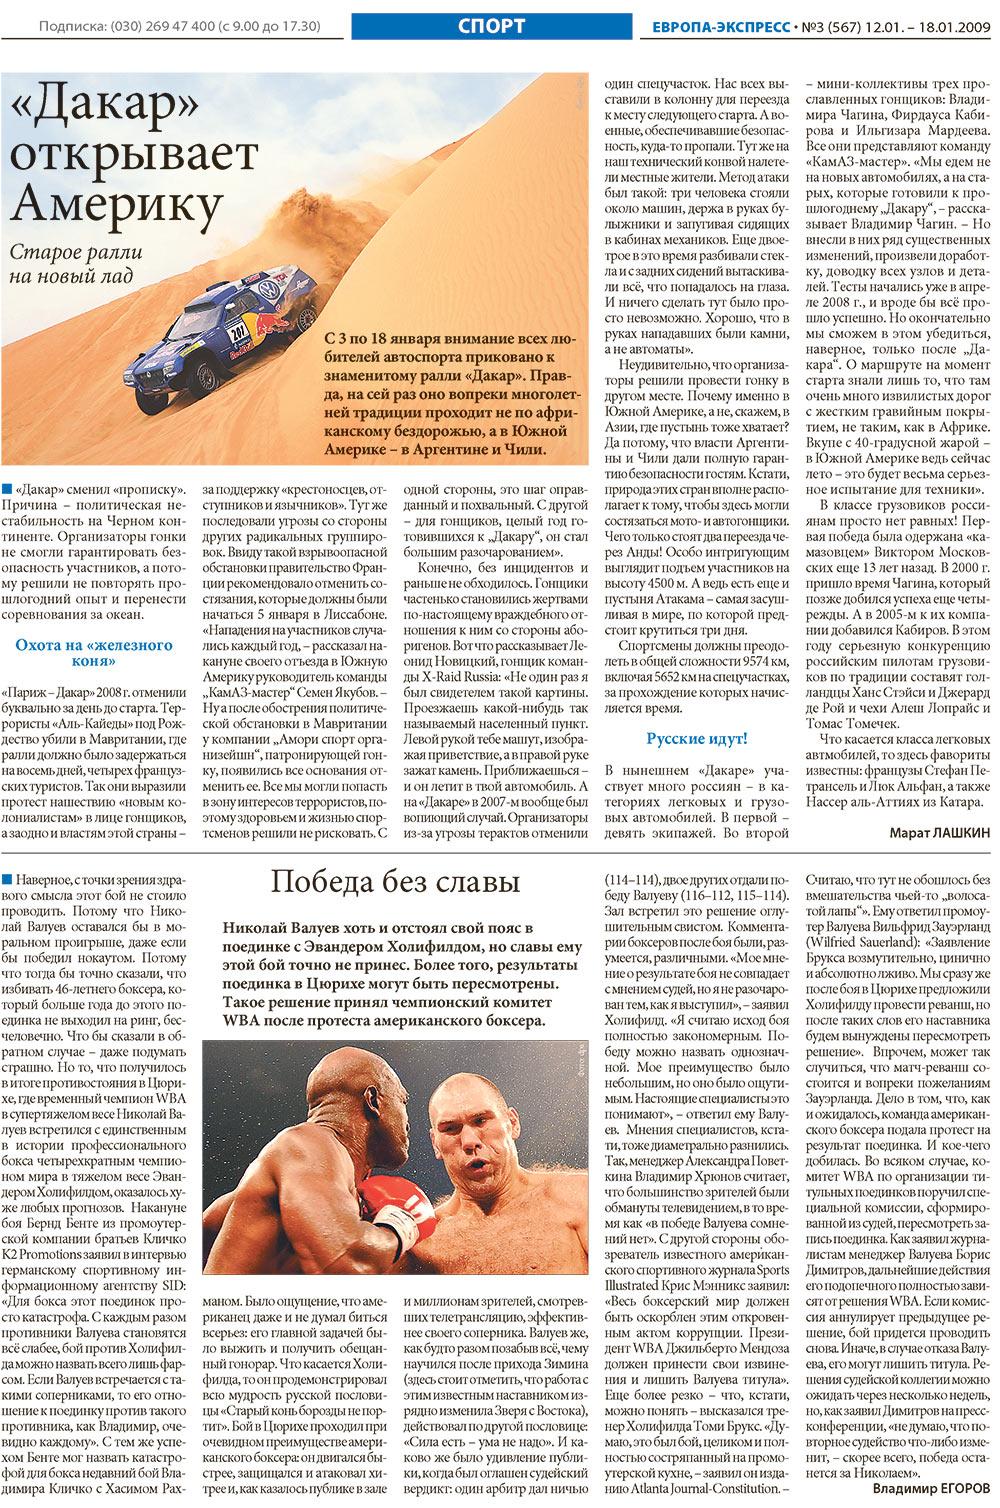 Европа экспресс (газета). 2009 год, номер 1, стр. 23